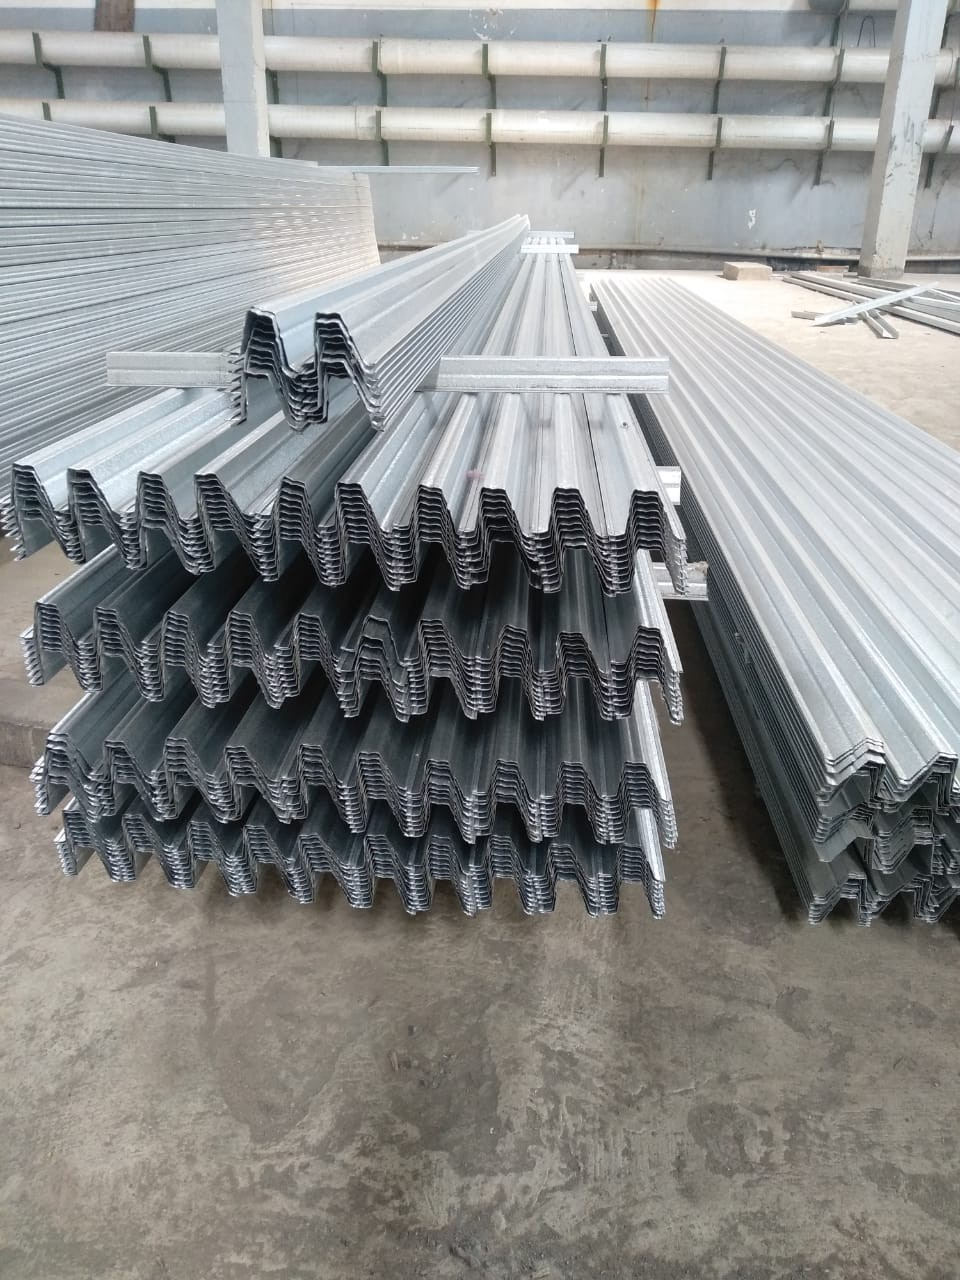 harga baja ringan bekas terlaris 082140494011 distributor galvalum atap di madium